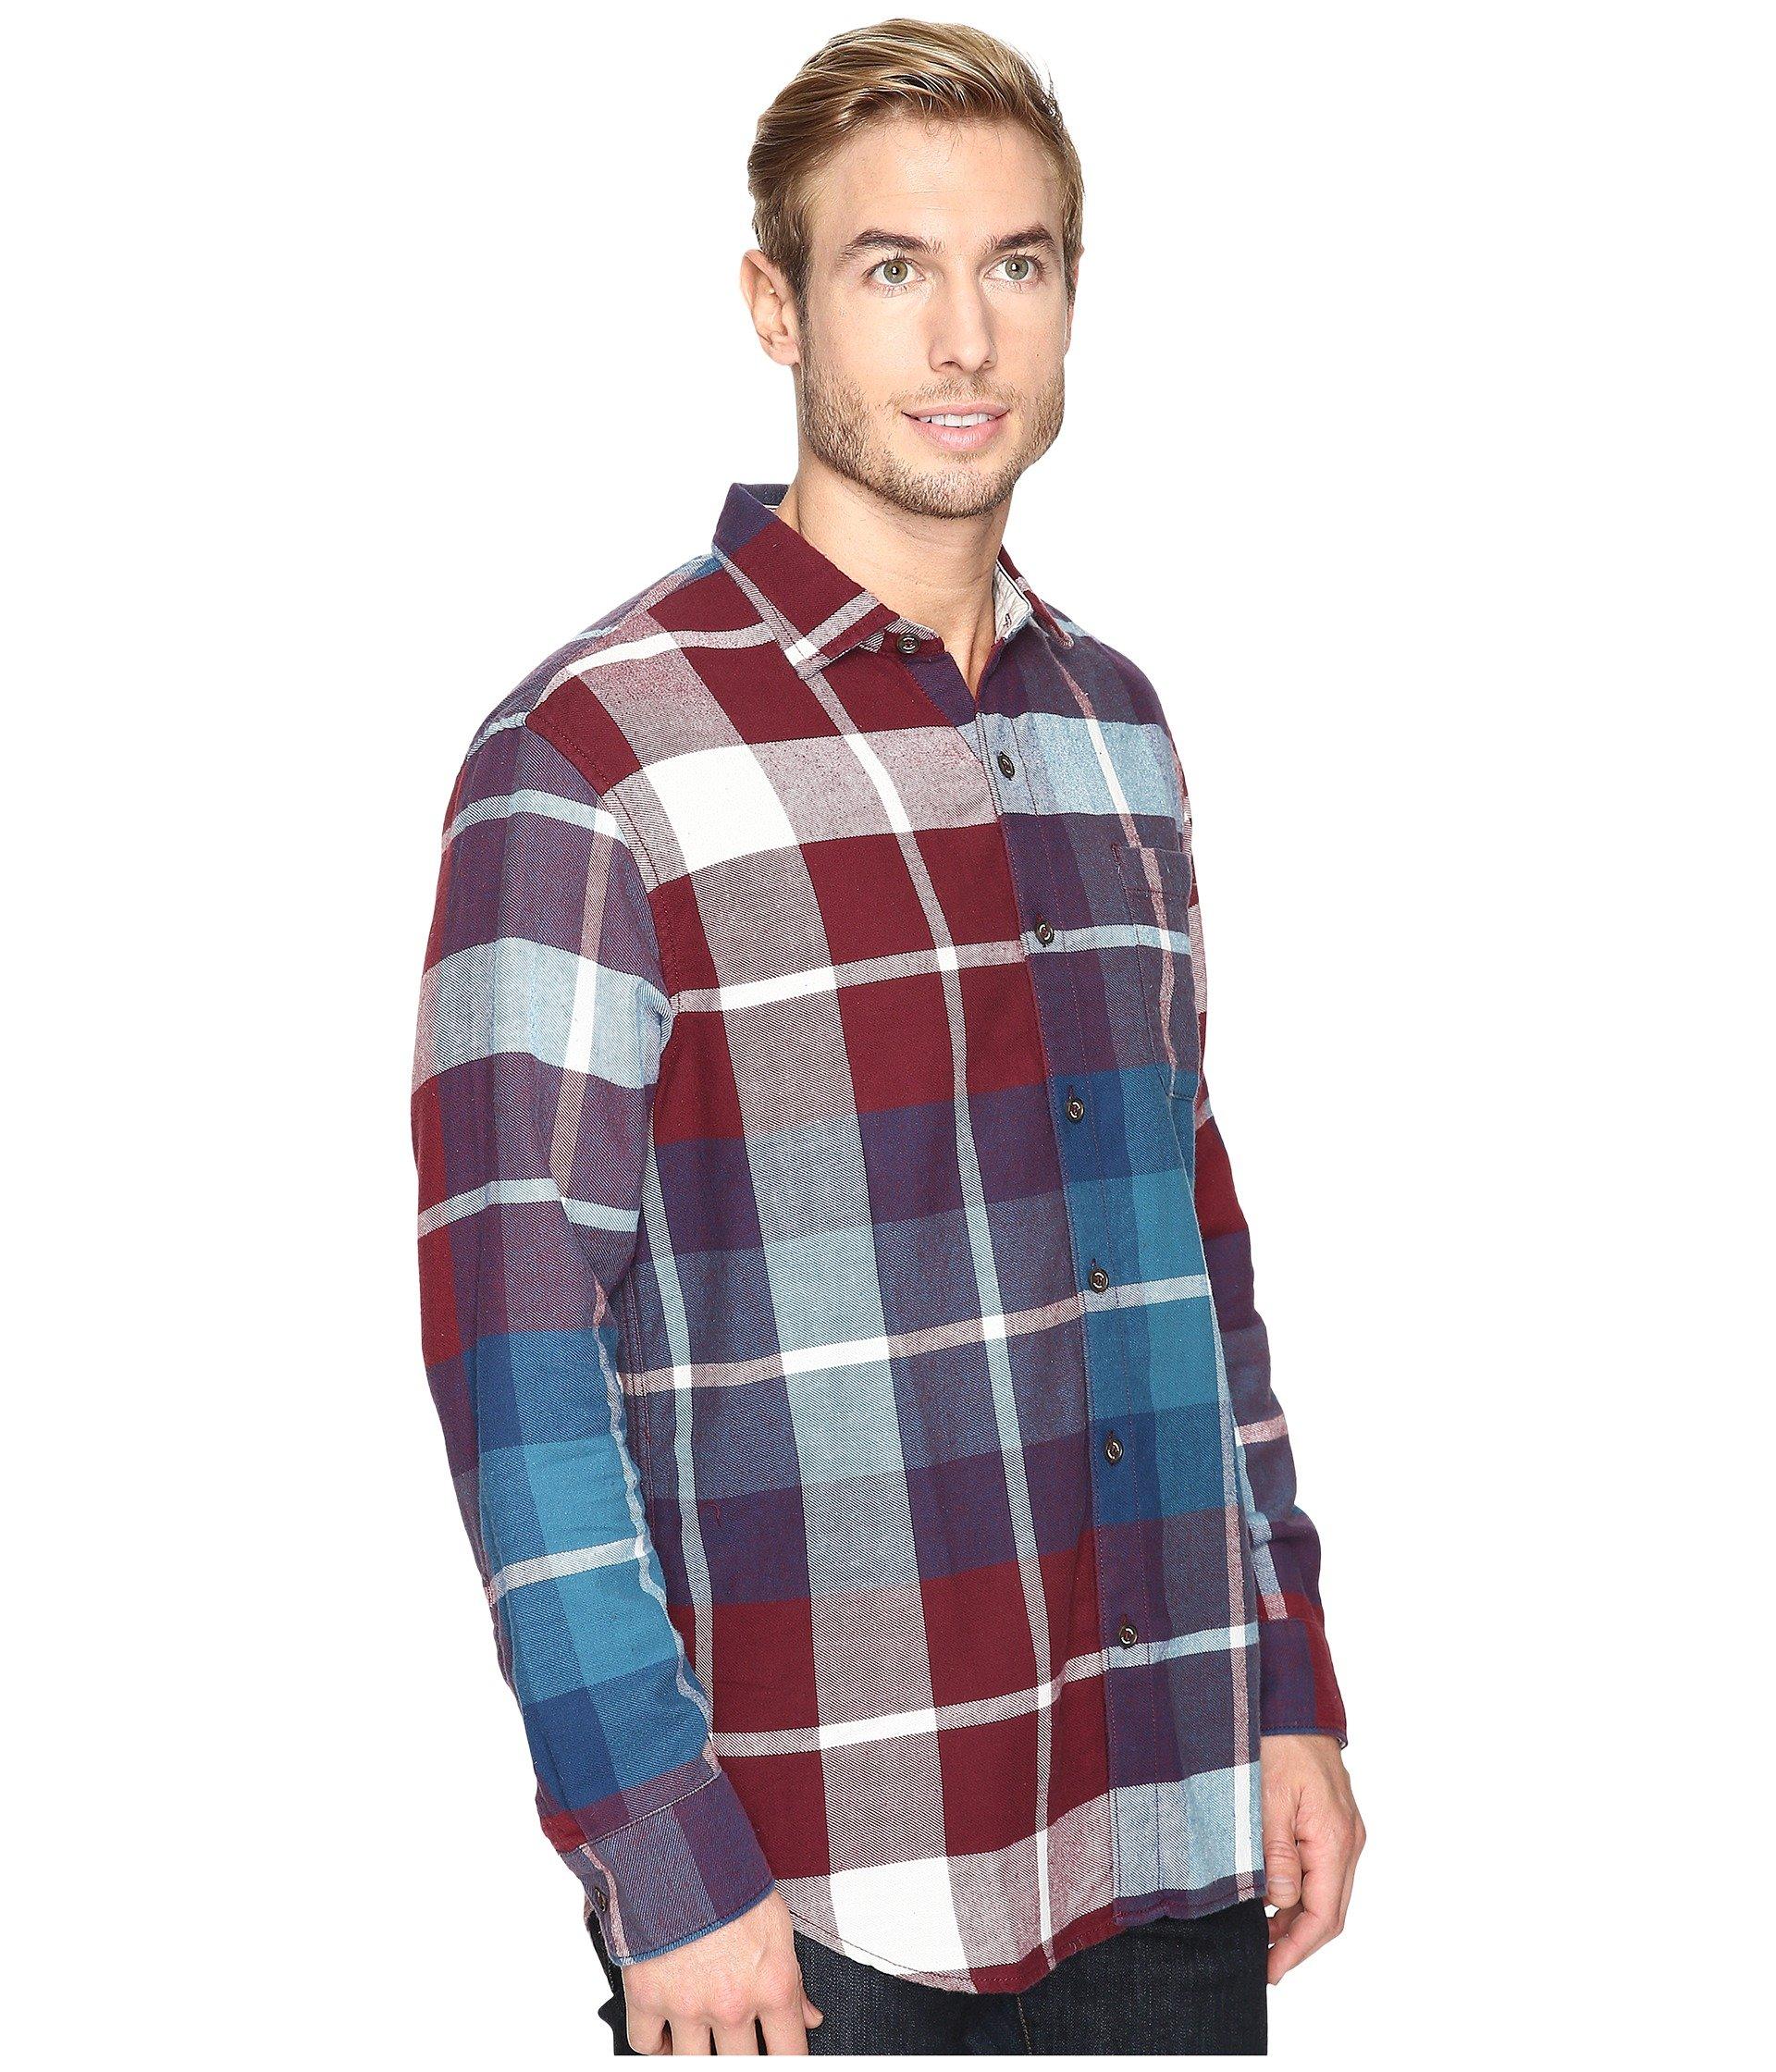 Tommy bahama acai flannel long sleeve woven shirt at 6pm for Tommy bahama long sleeve dress shirts